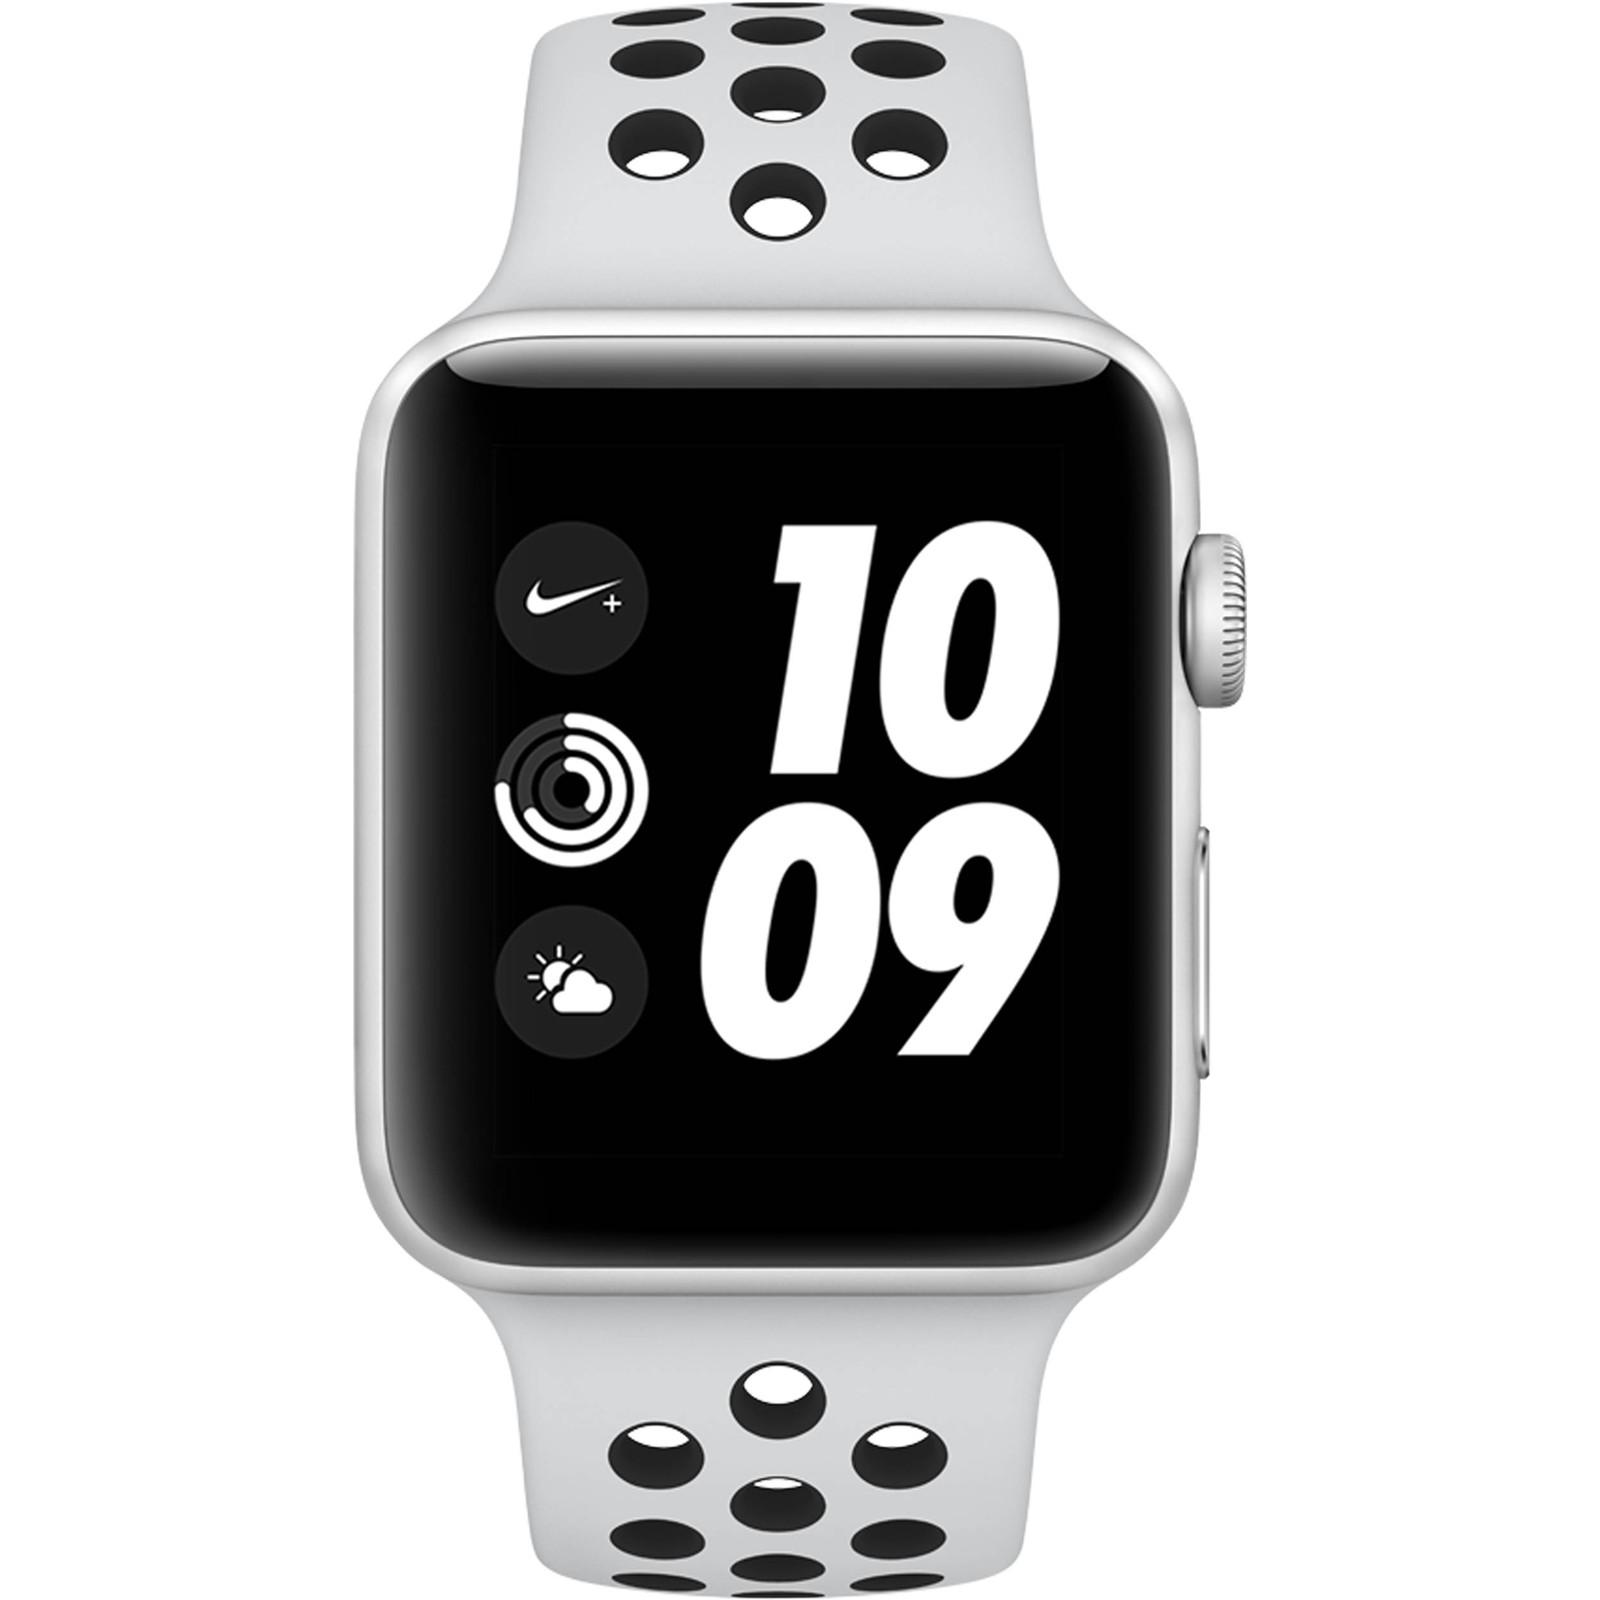 2c3c38ce31dc Apple Watch Series 3 Nike+ GPS 42mm Silver Aluminium Case with Pure  Platinum Black Nike Sport Band